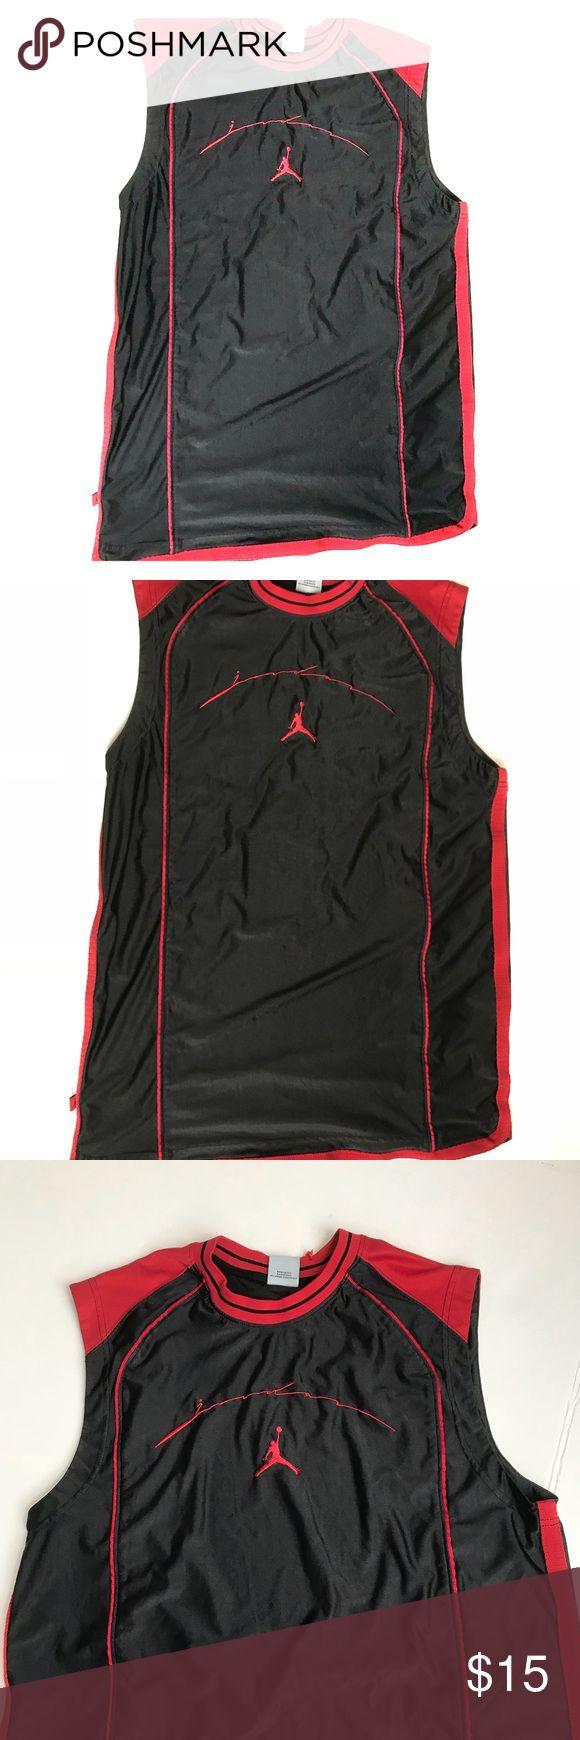 "Michael Jordan basketball jersey sz L Small tear on neck  Please review photos  32"" L 21.5"" pit to pit 46"" waist Jordan Shirts"